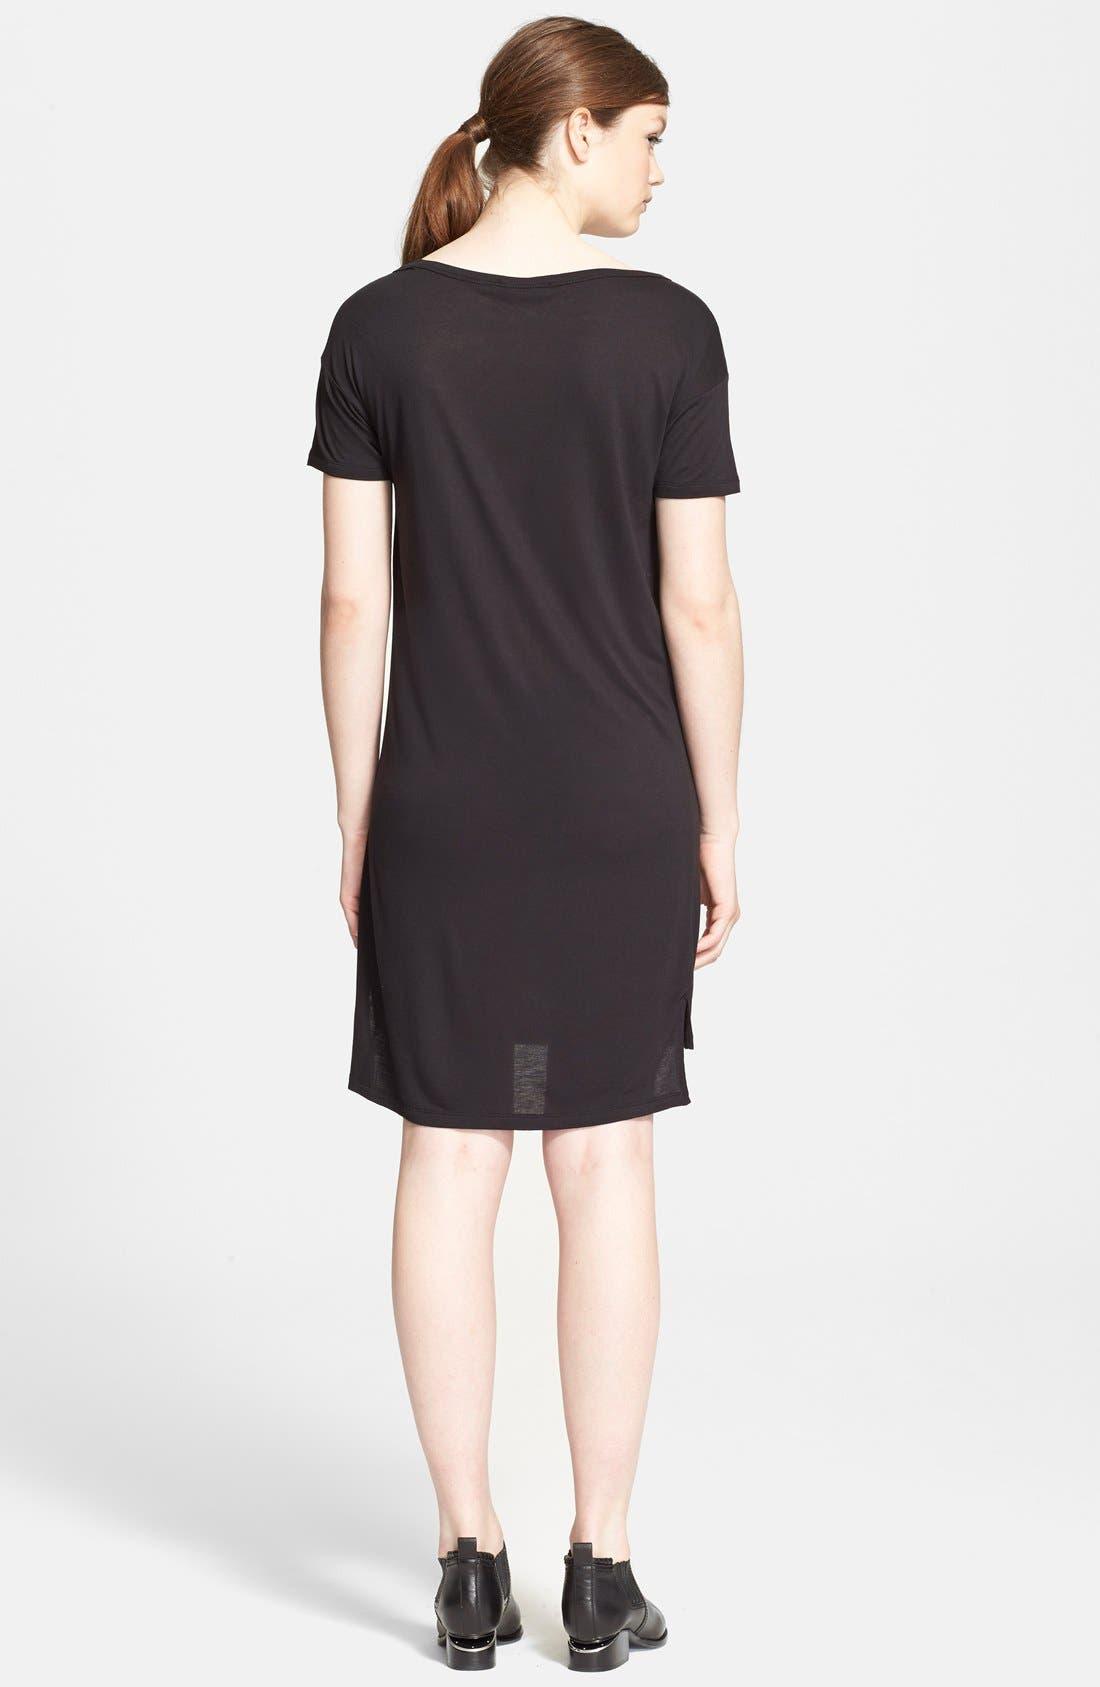 T by Alexander Wang Jersey Dress,                             Alternate thumbnail 2, color,                             001